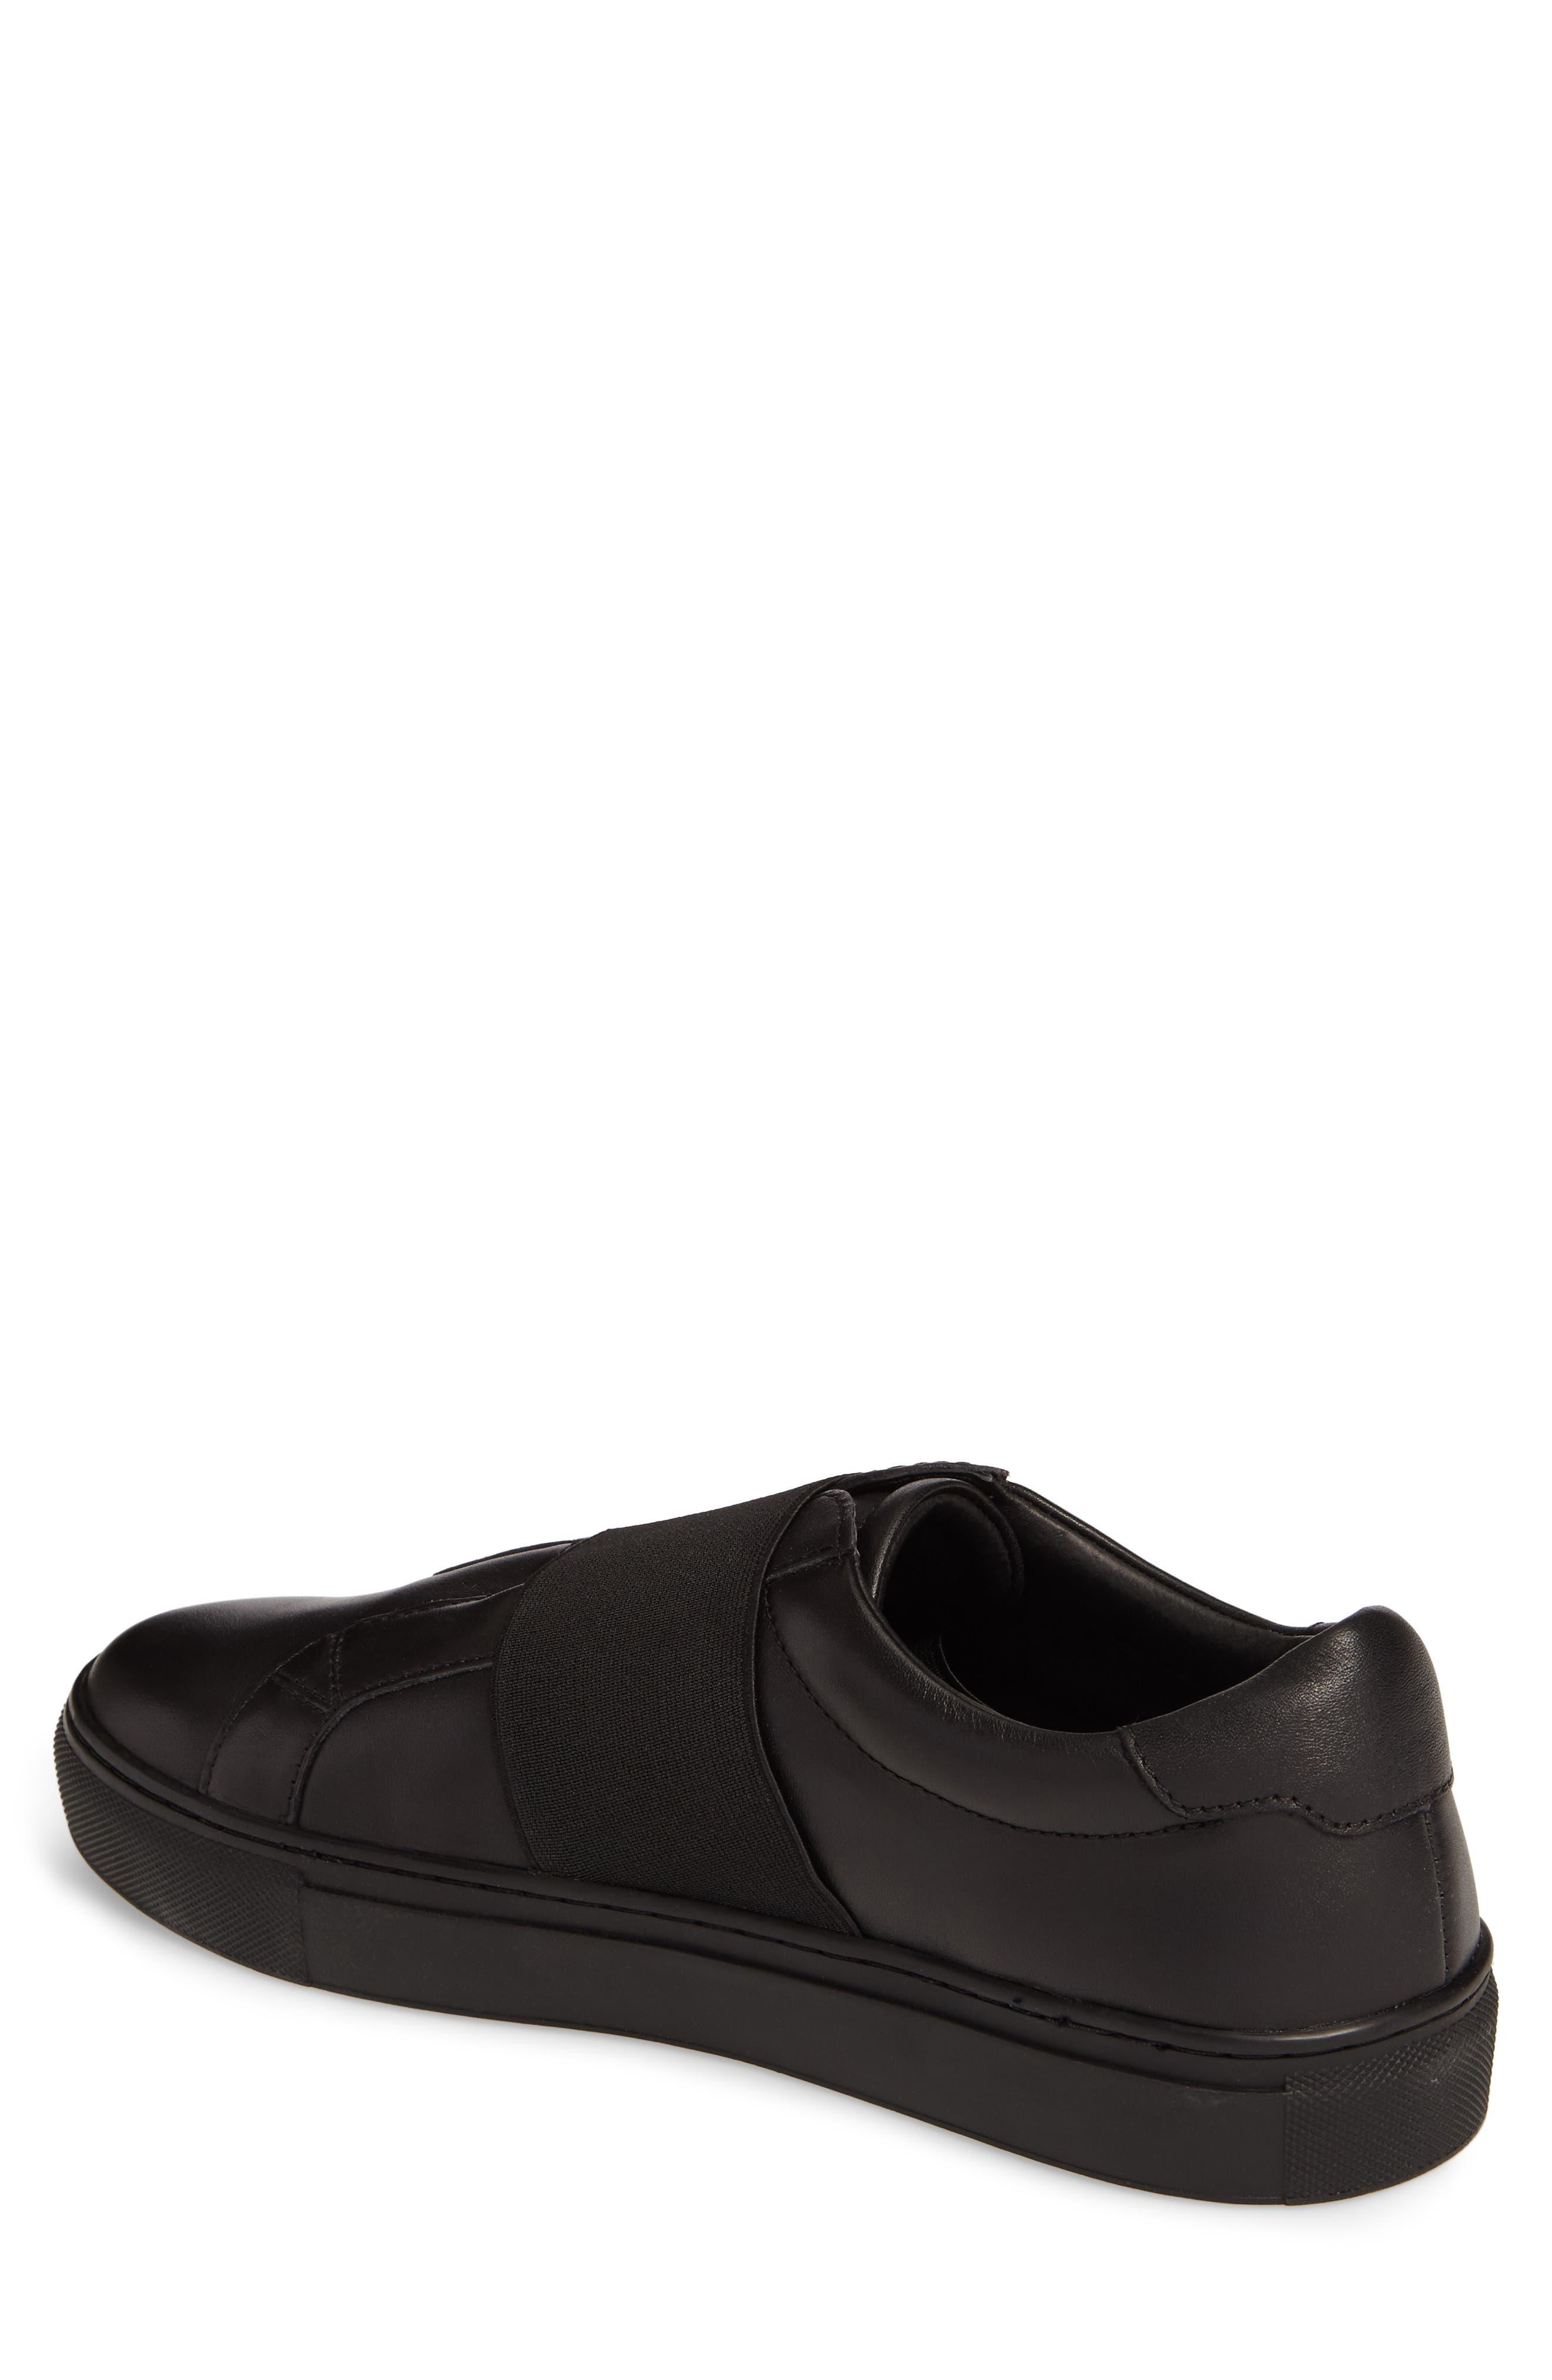 Darel Slip-On,                             Alternate thumbnail 2, color,                             Black Leather